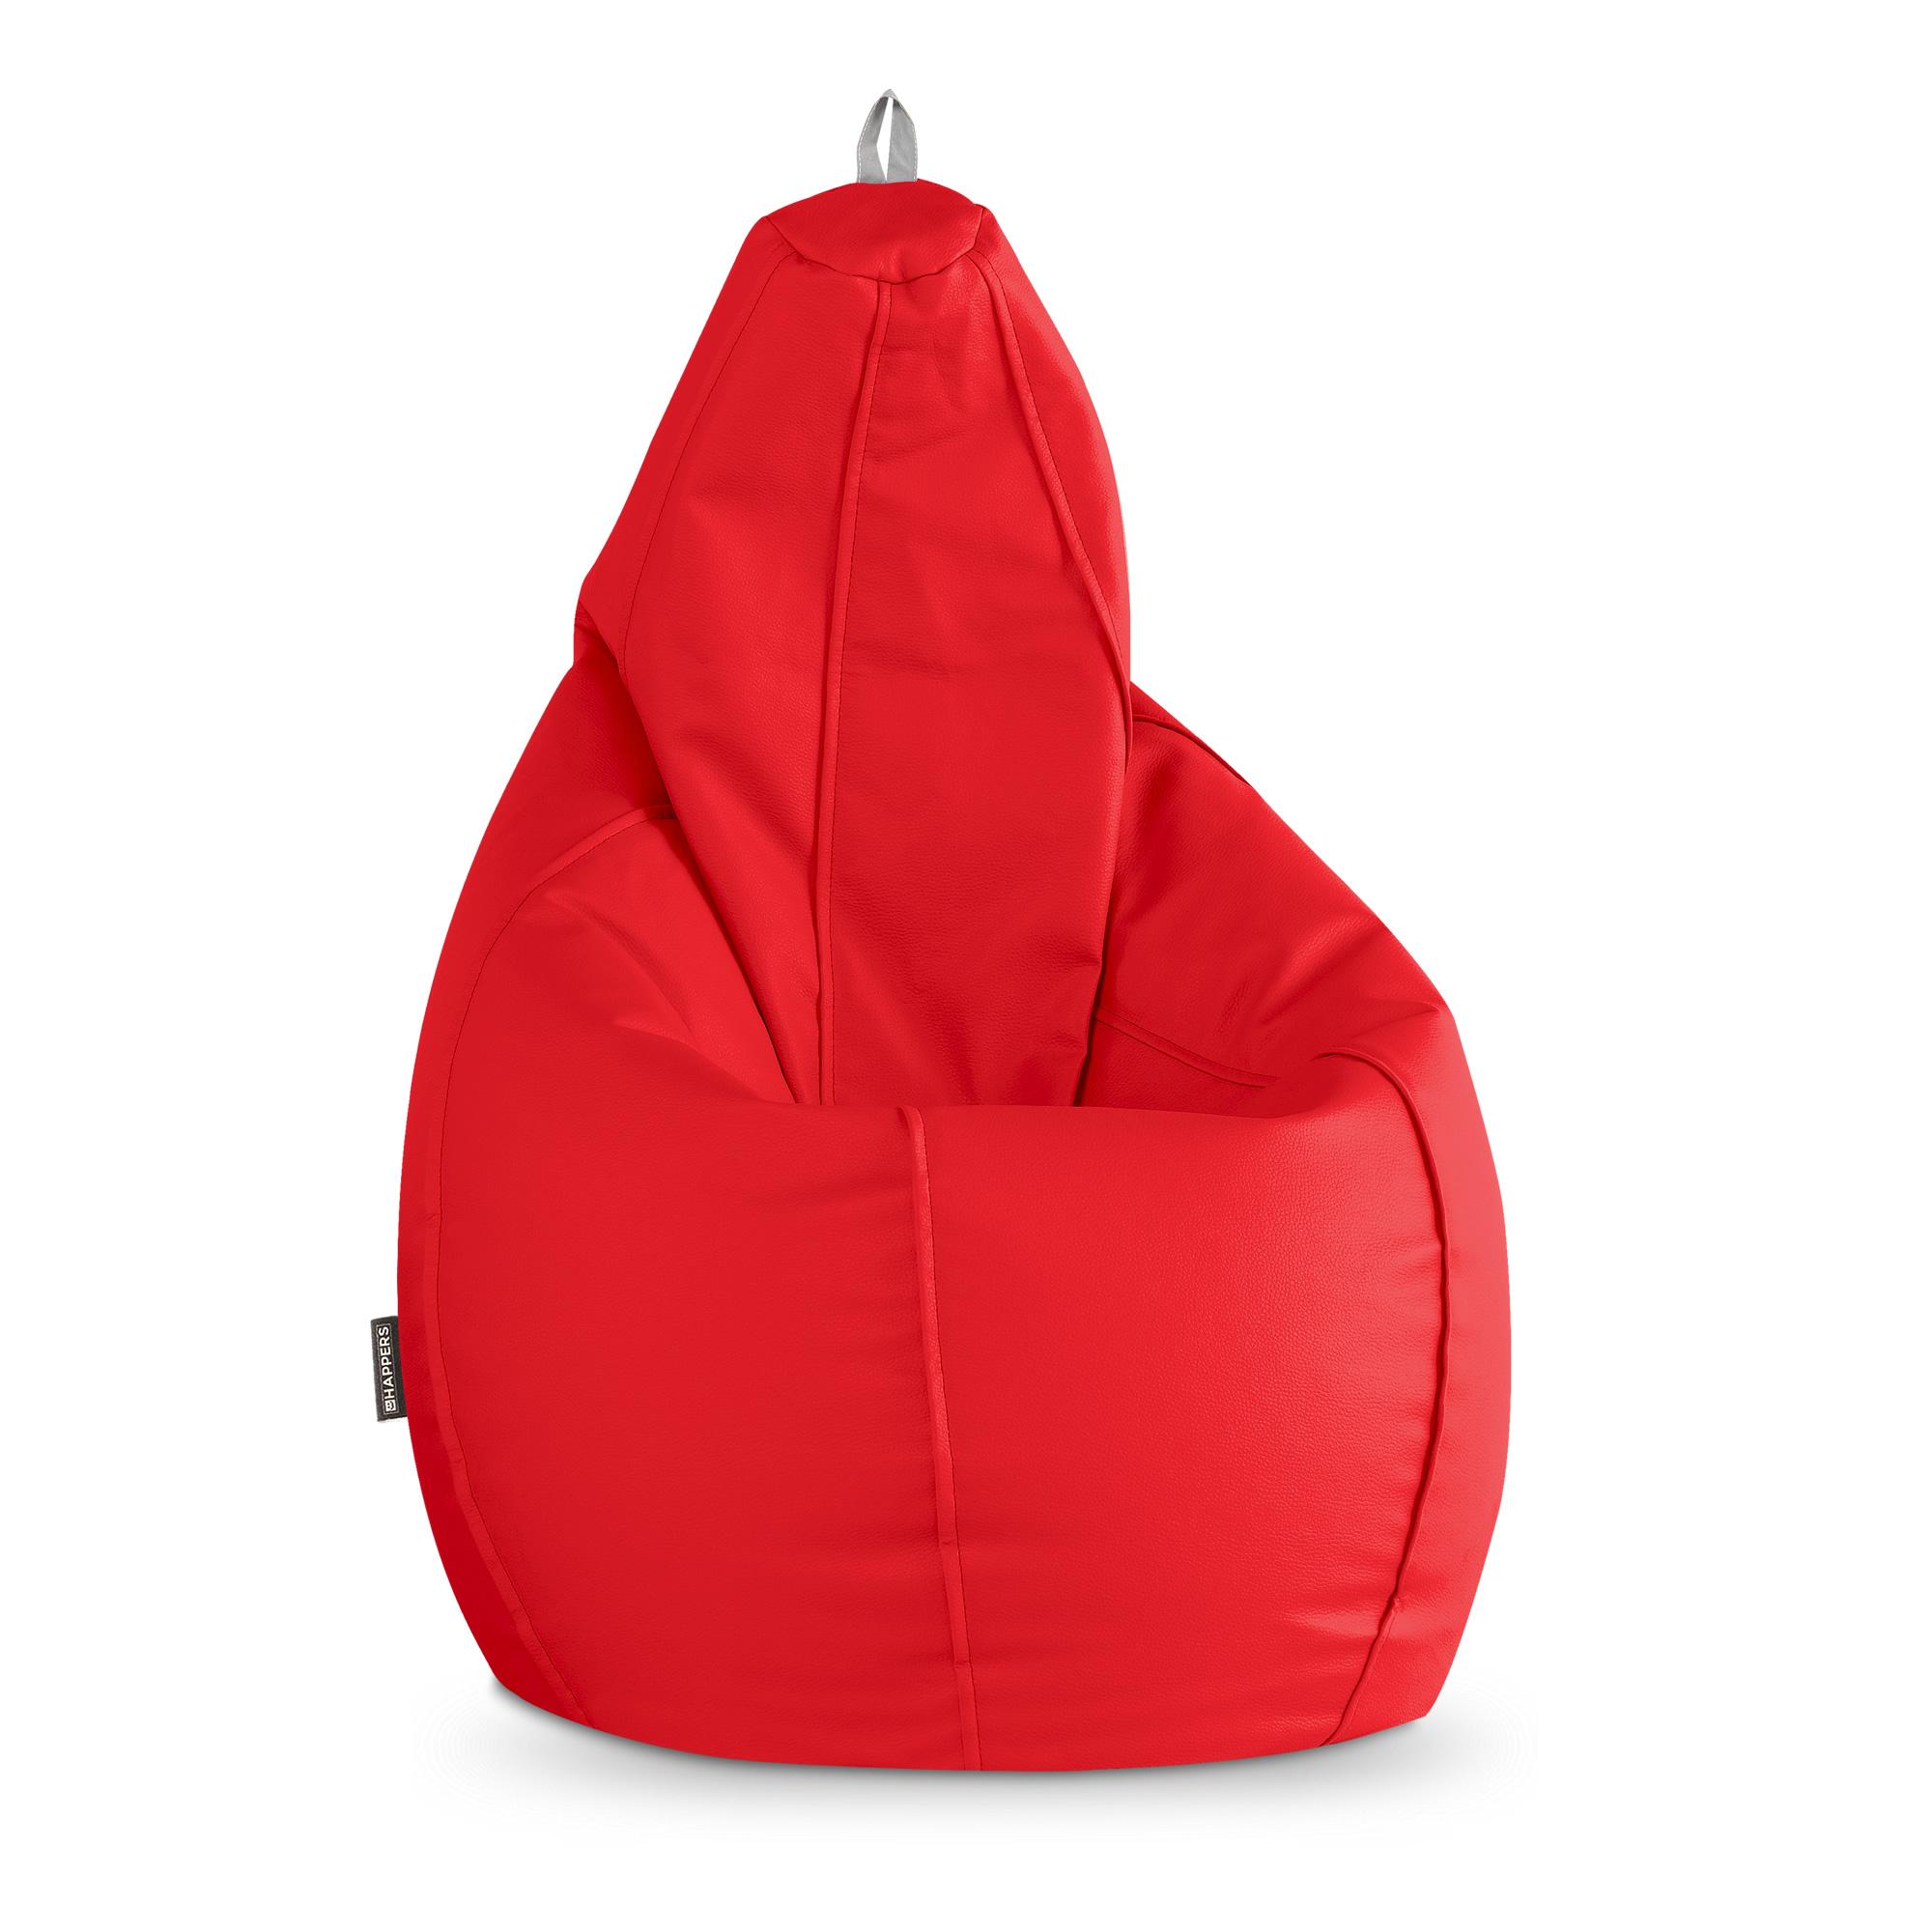 Puff Pera Polipiel Indoor Rojo Happers | Happers.es